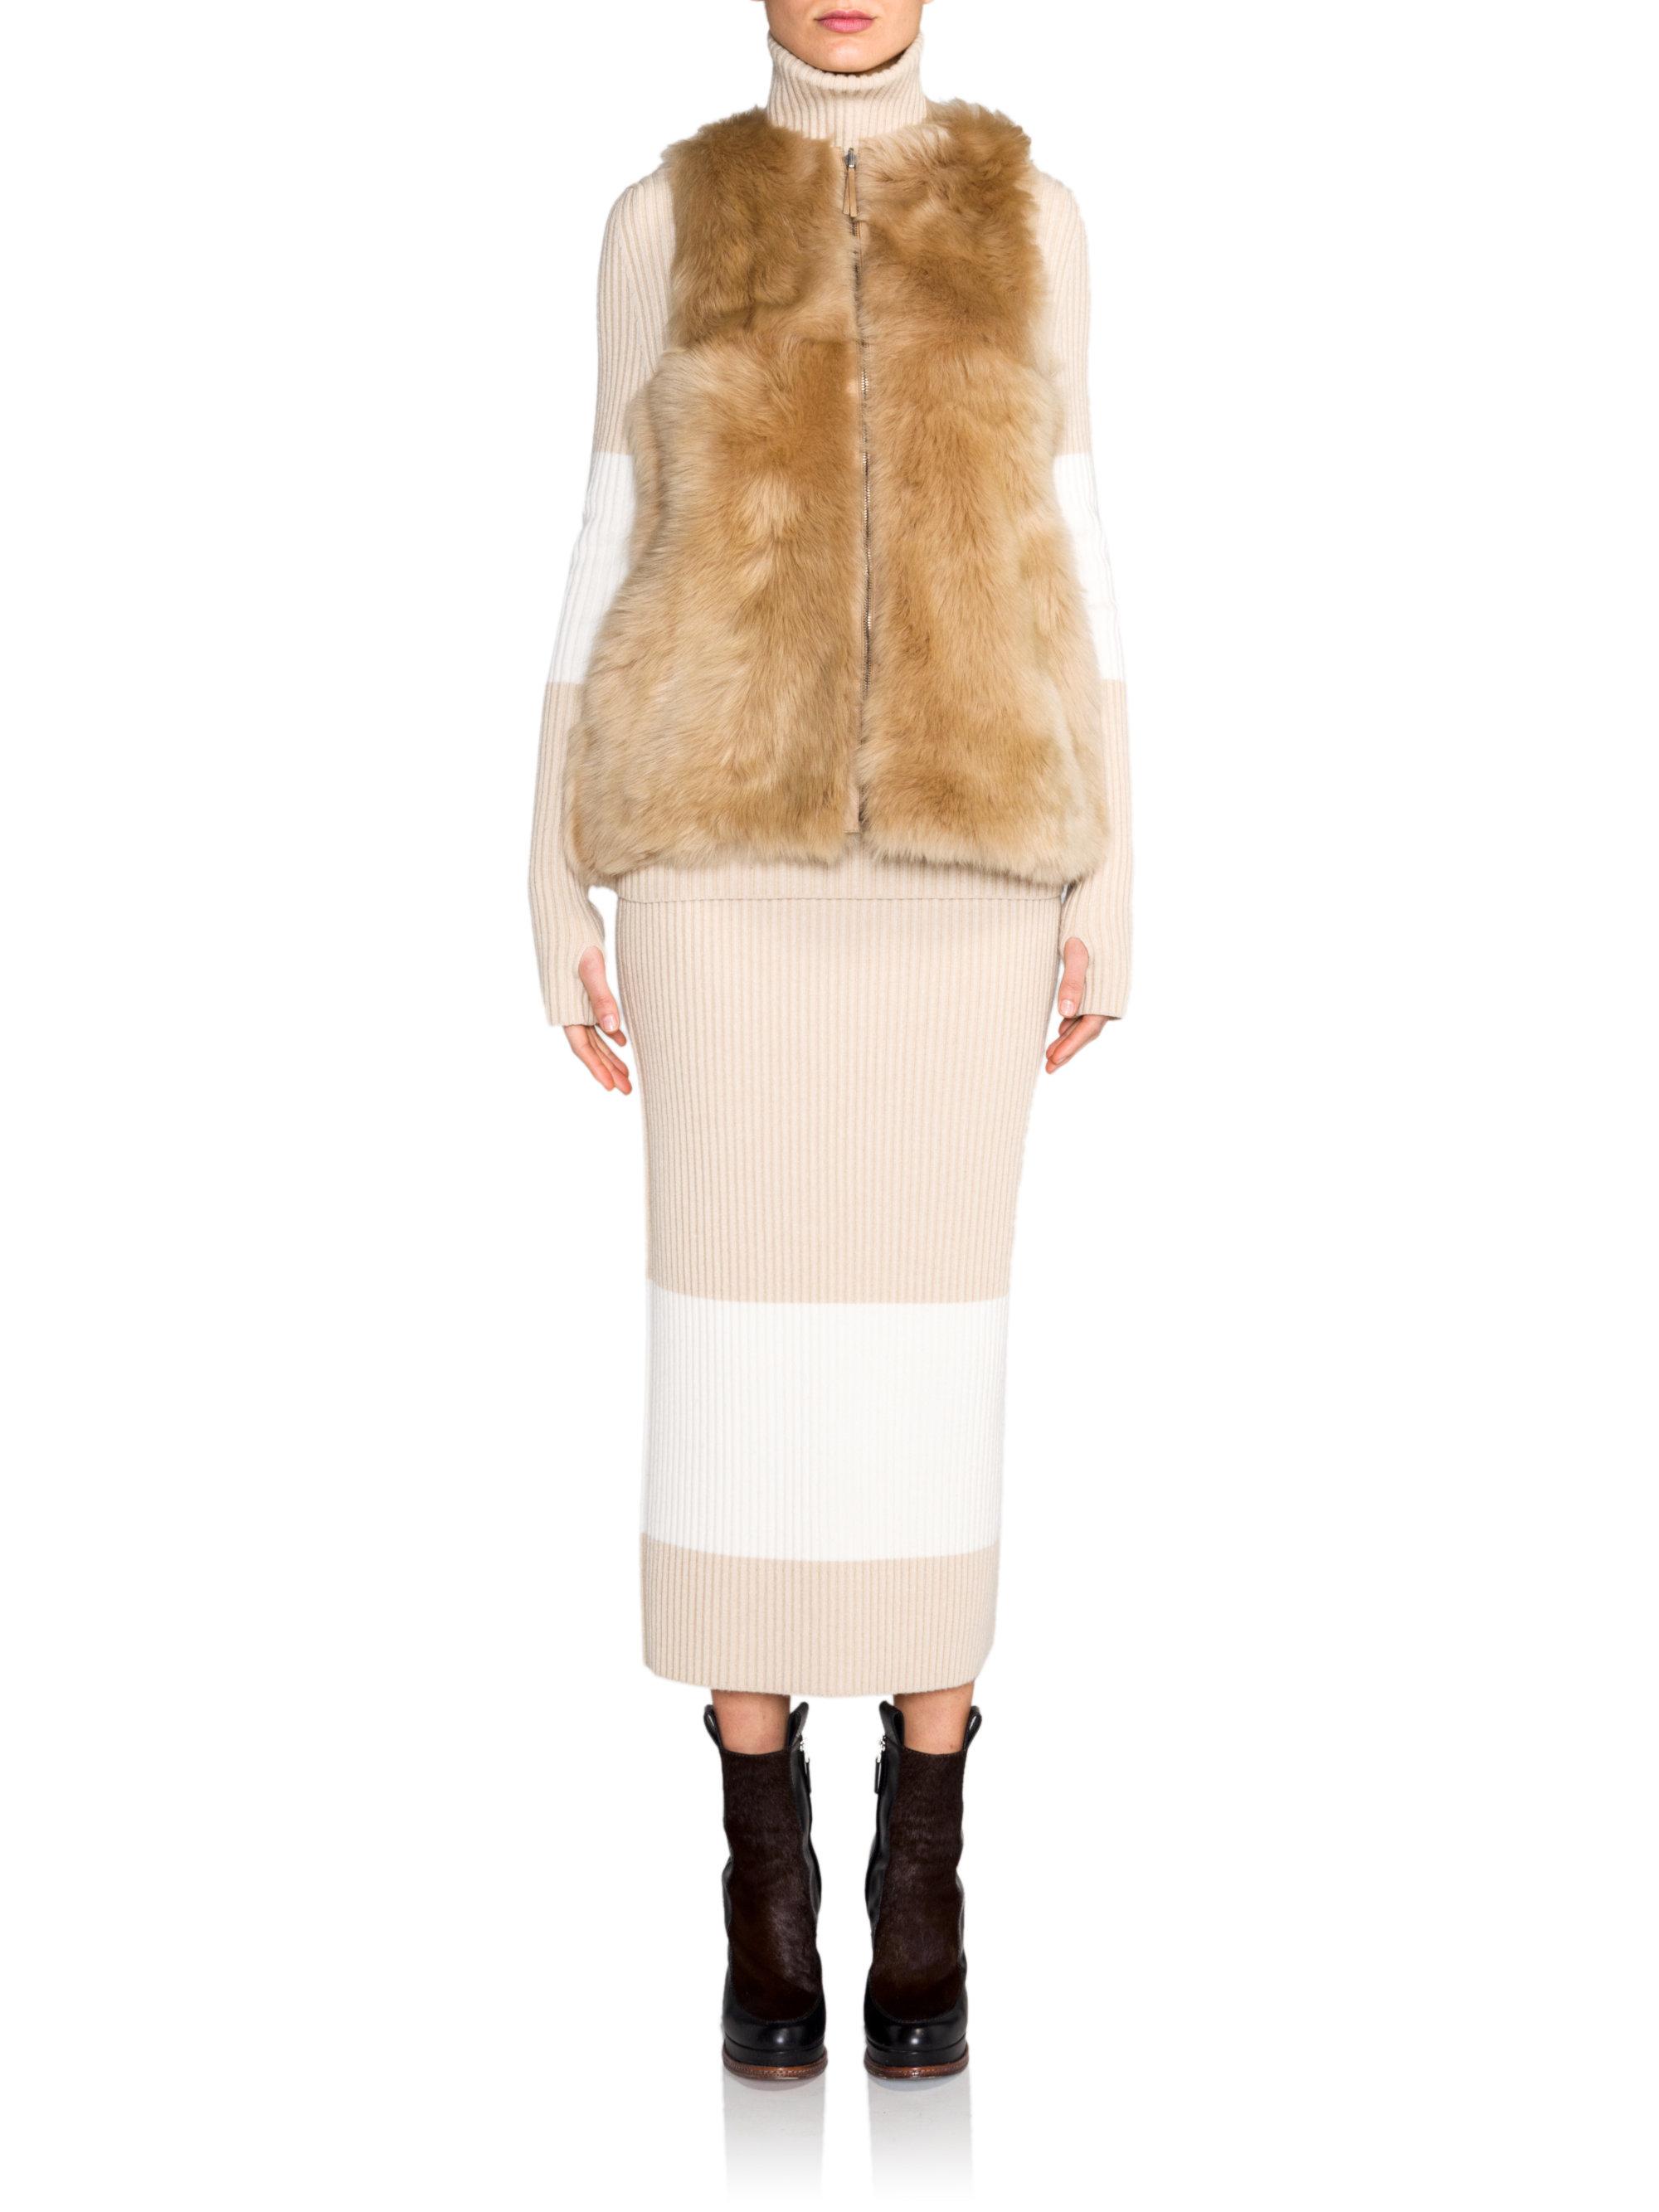 Fendi Shearling Fur Vest In Camel Brown Lyst